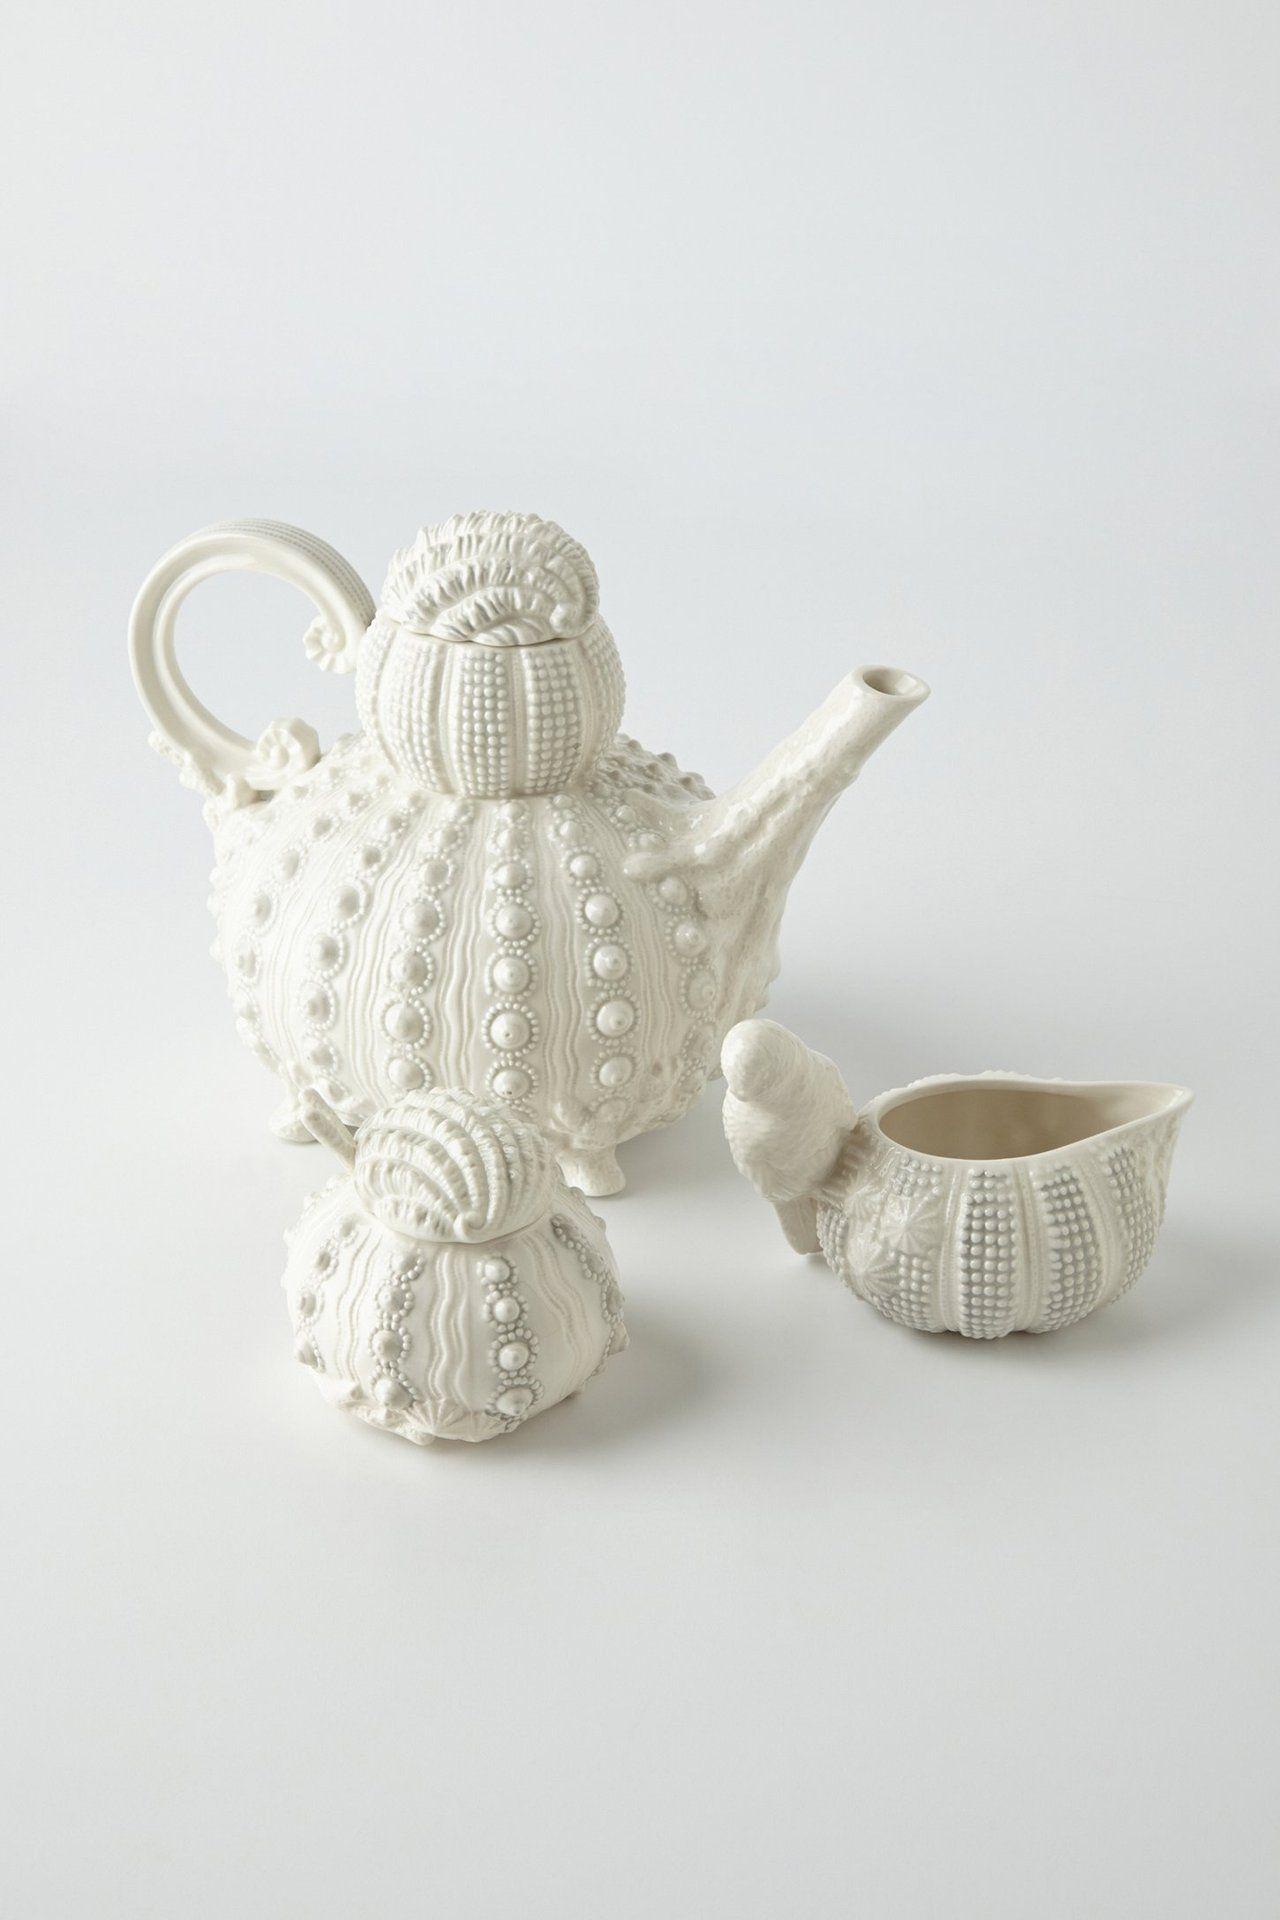 storehouseannex waltzingmatildablog cool tea pot  teadu thé  - storehouseannex waltzingmatildablog cool tea pot